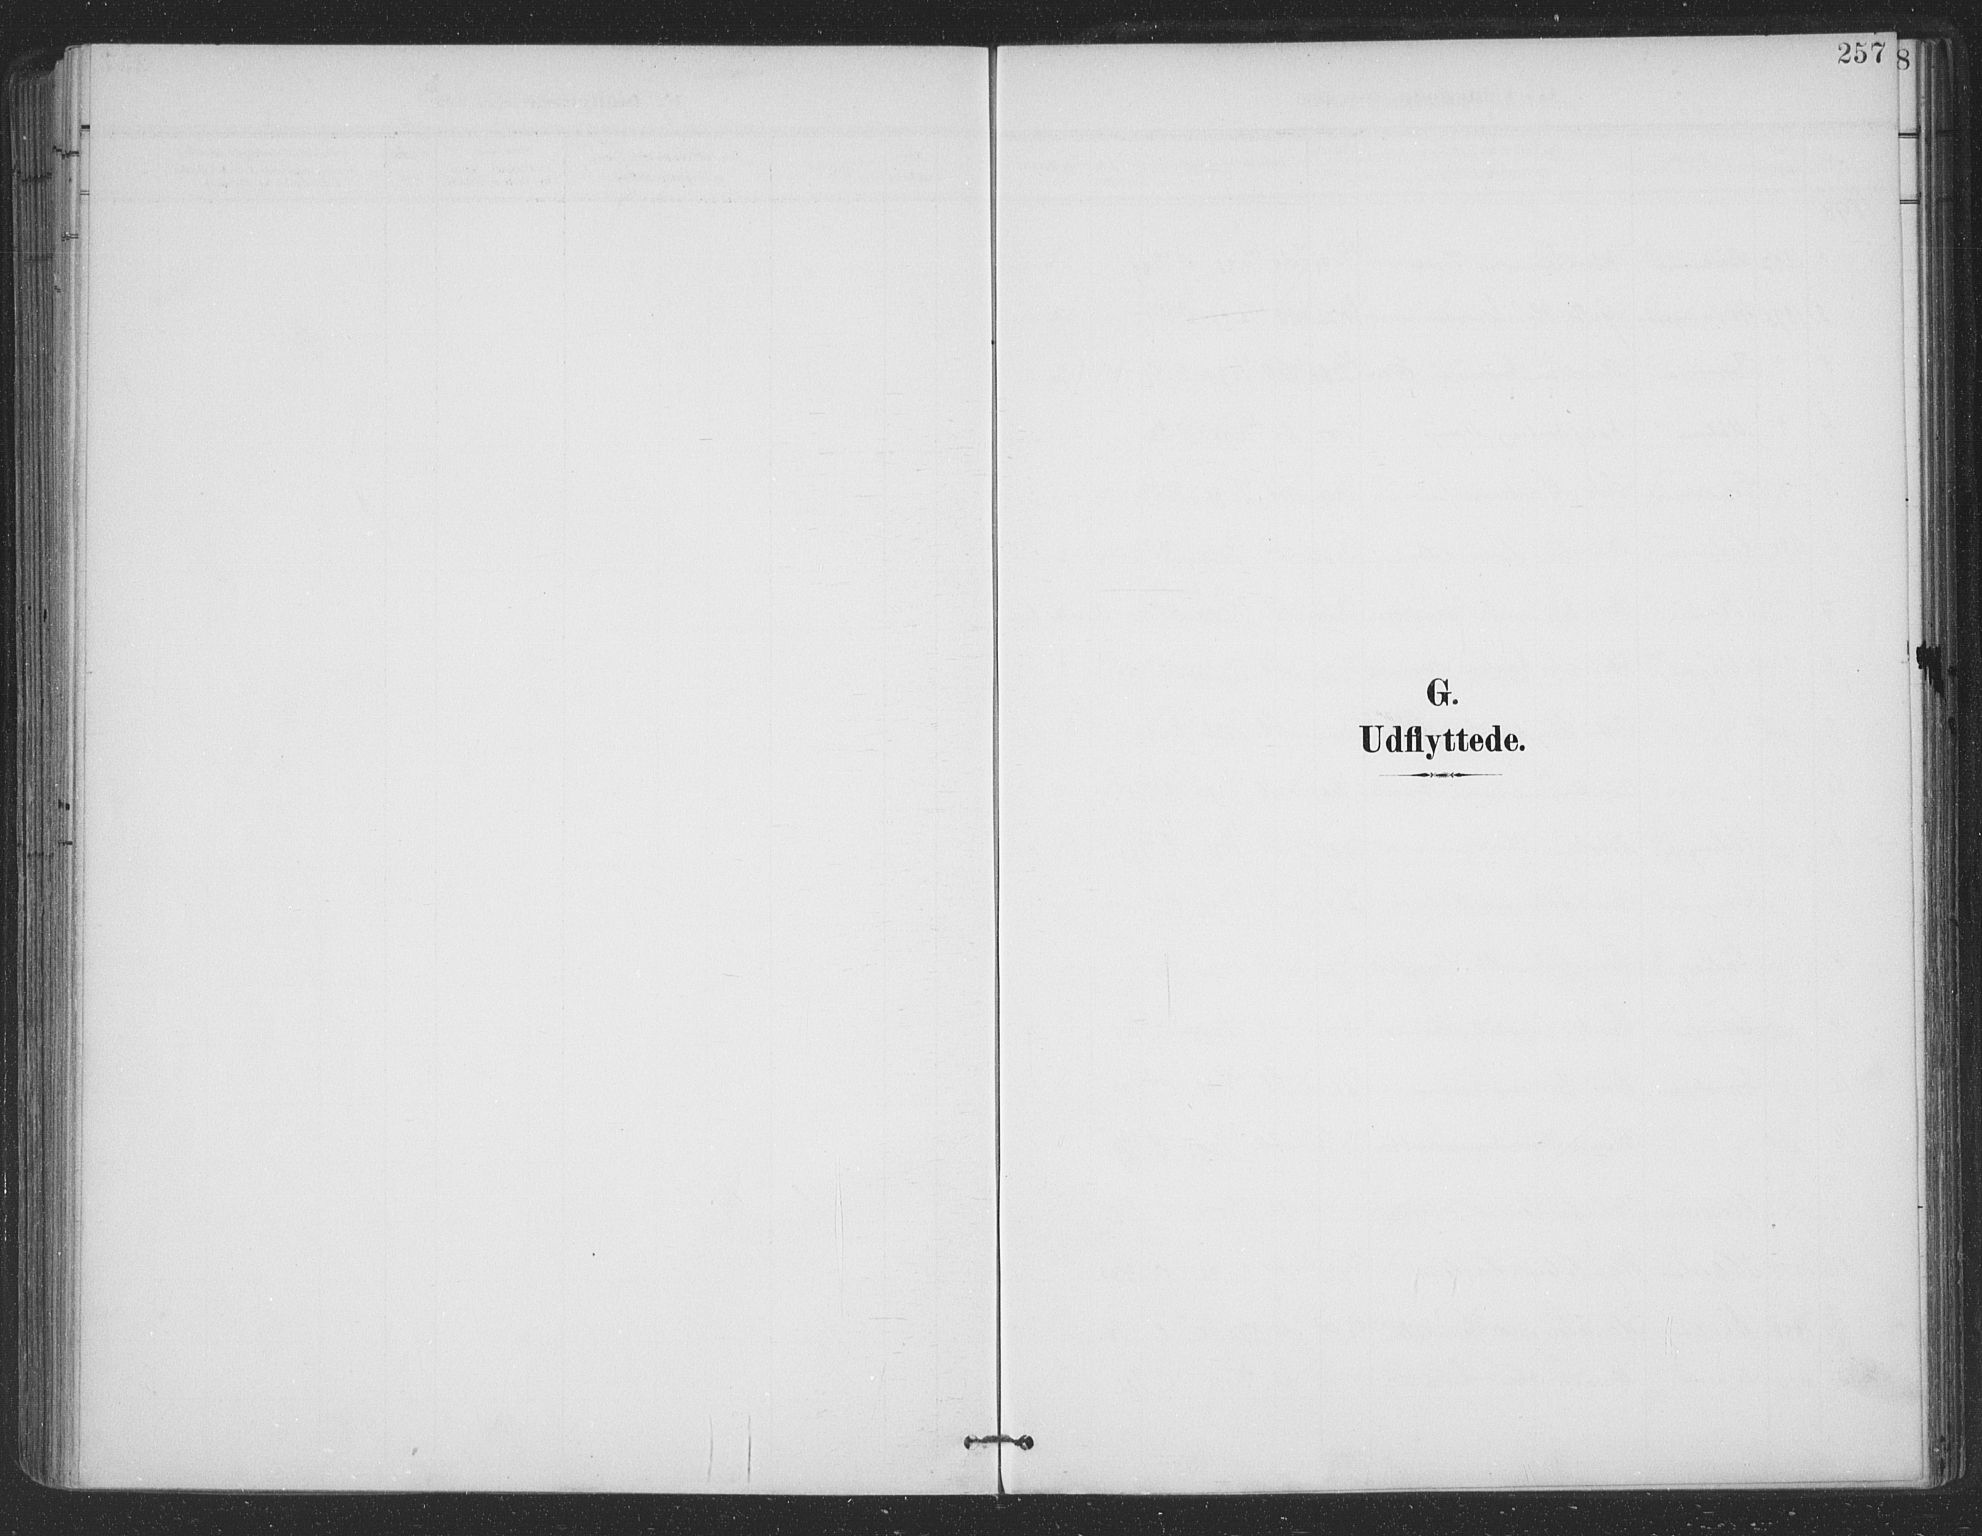 SAT, Ministerialprotokoller, klokkerbøker og fødselsregistre - Nordland, 863/L0899: Ministerialbok nr. 863A11, 1897-1906, s. 257